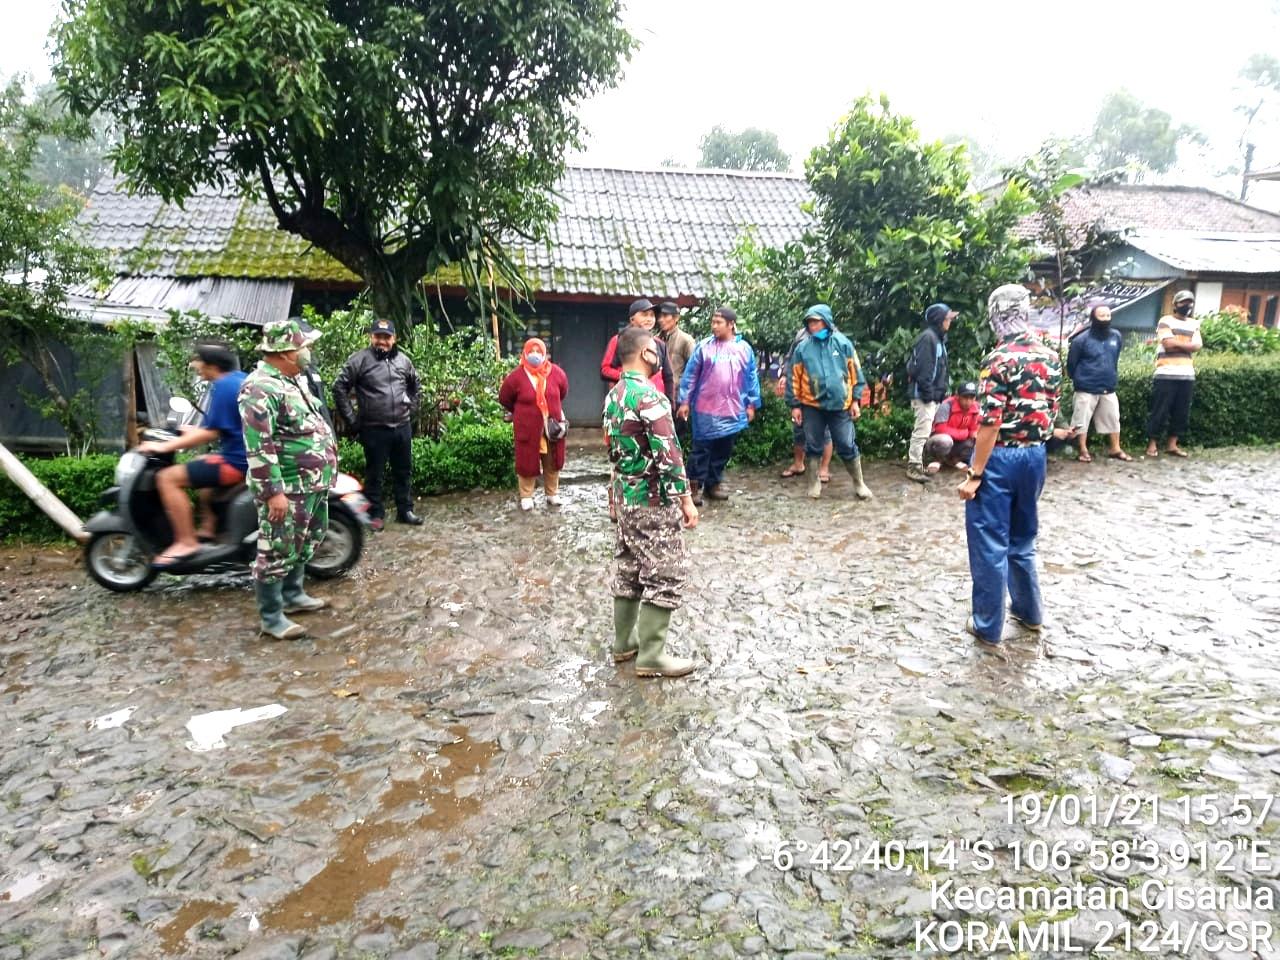 Danrem 061/Sk Tinjau Banjr Bandang  dan Lokasi Pengungsian Gunungmas Cisarua Kab. Bogor